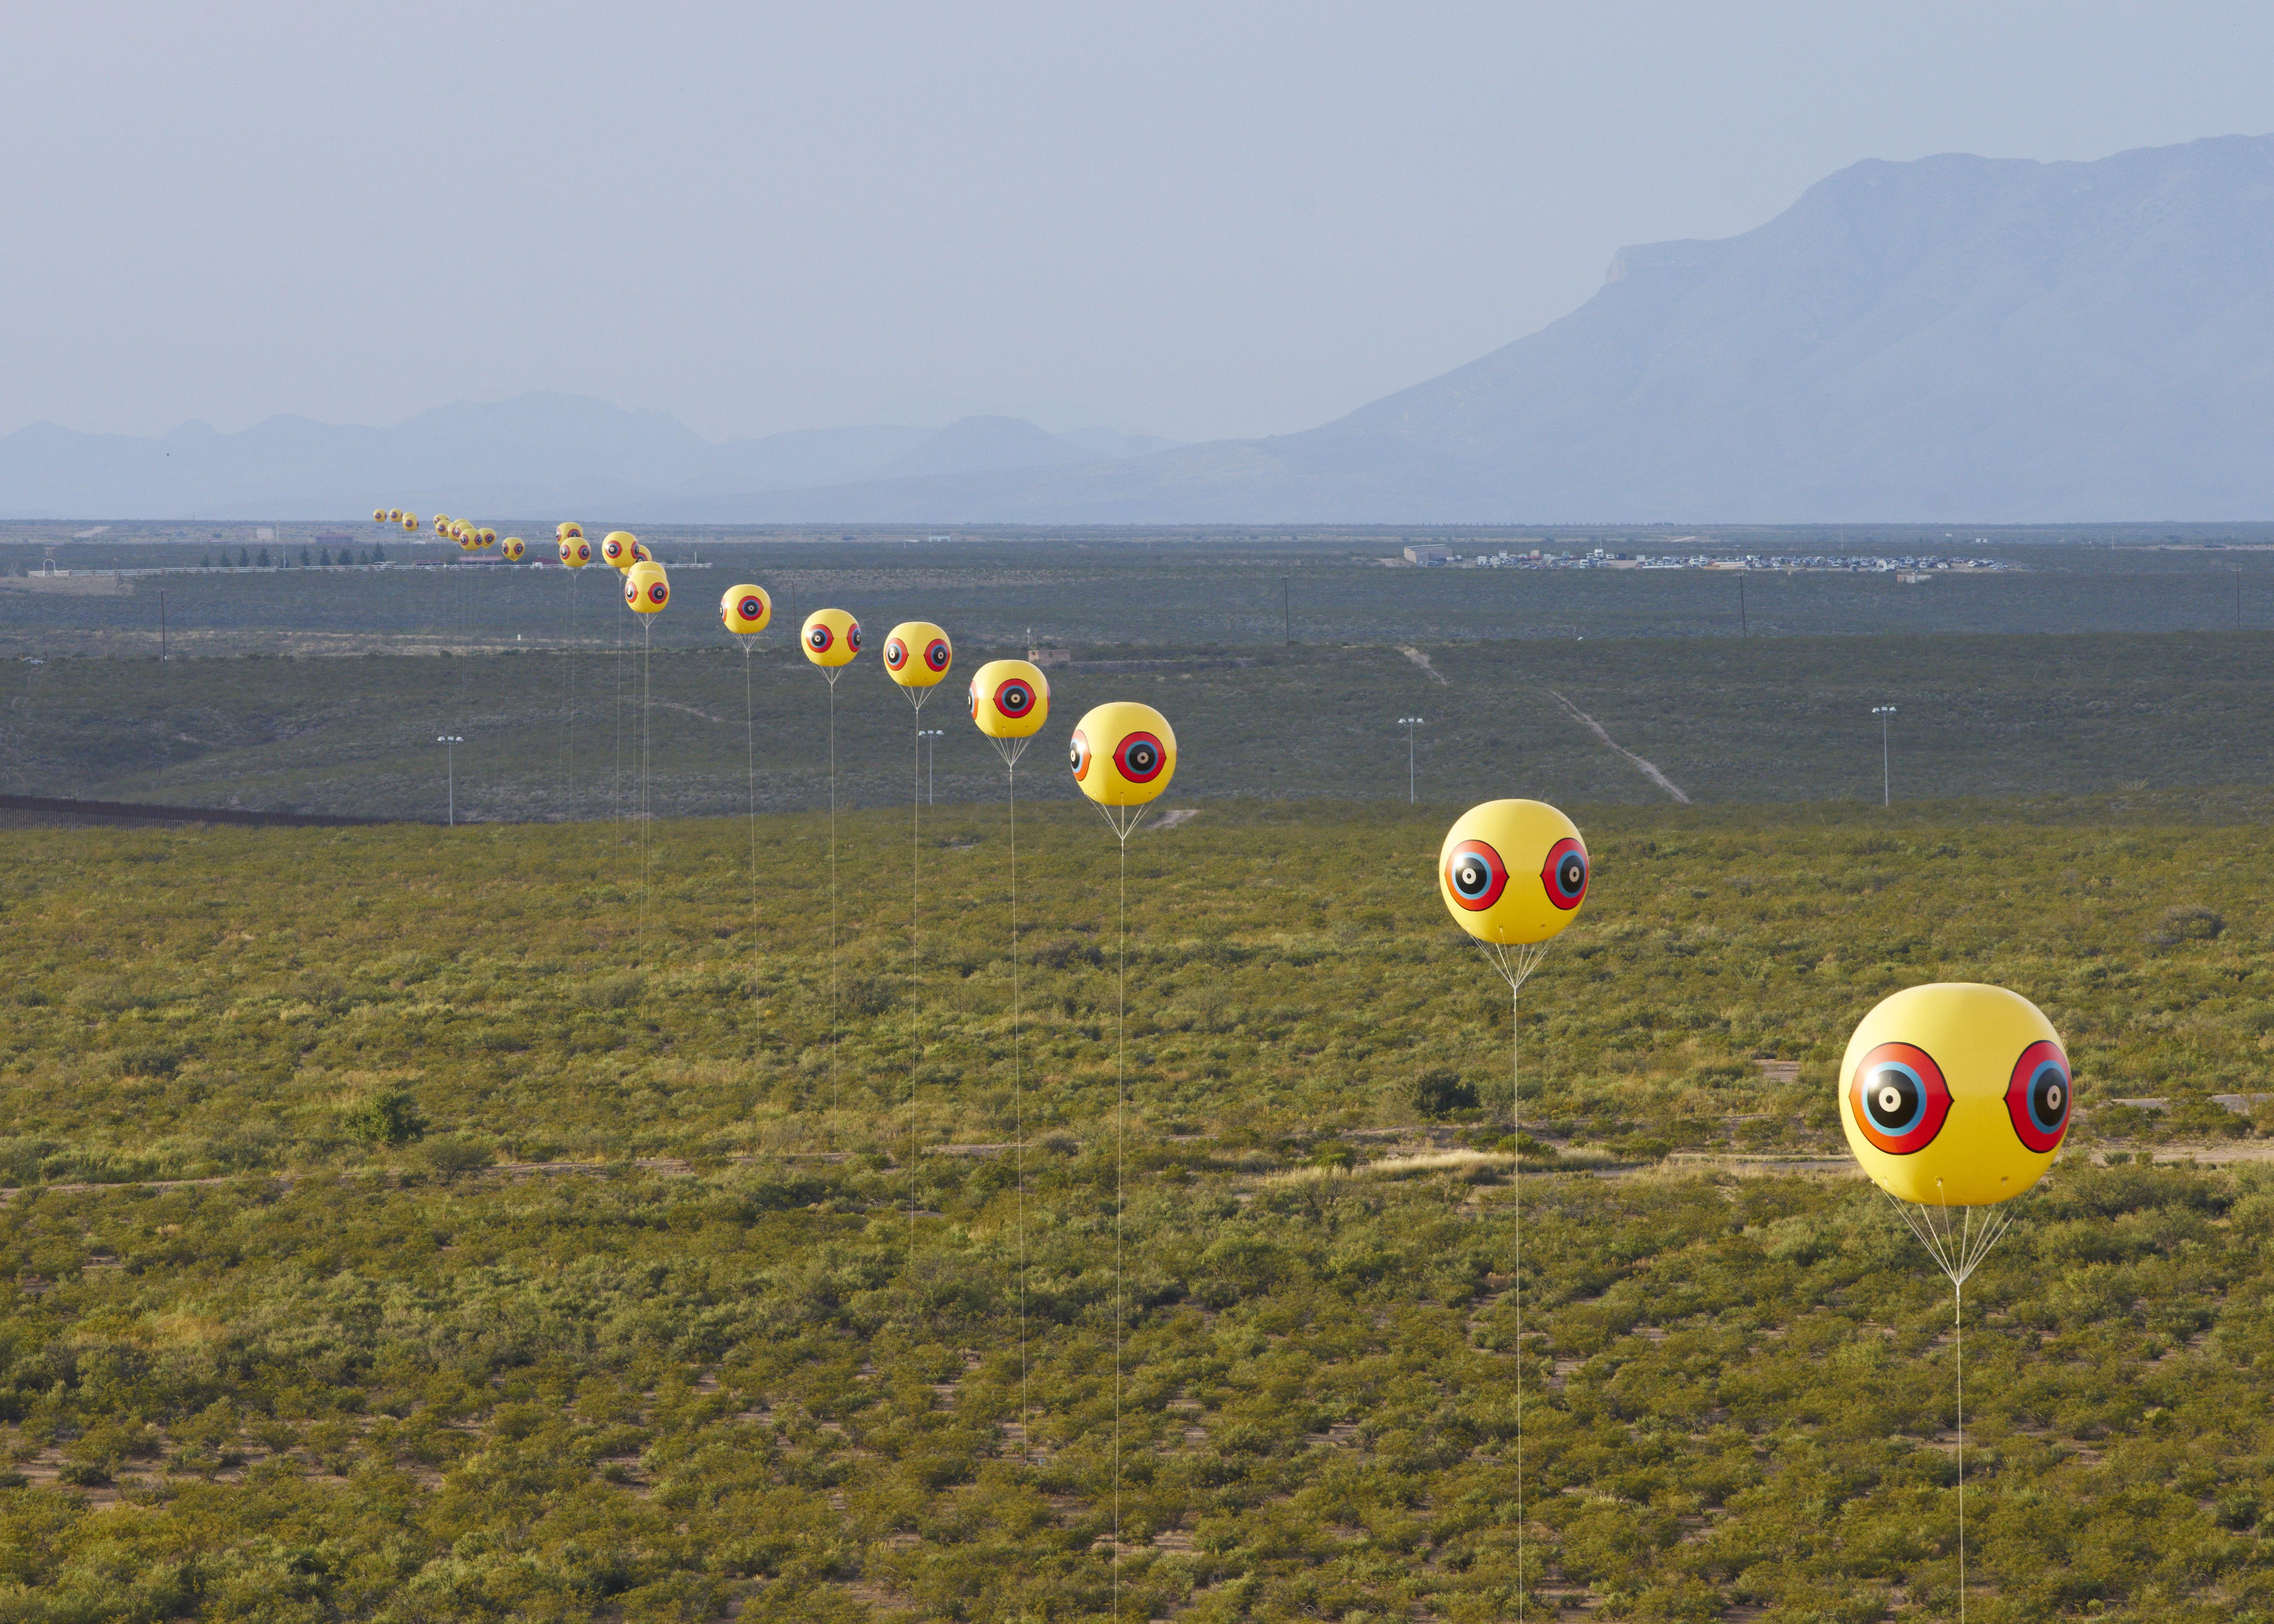 Eyeball balloons placed in a line across a desert